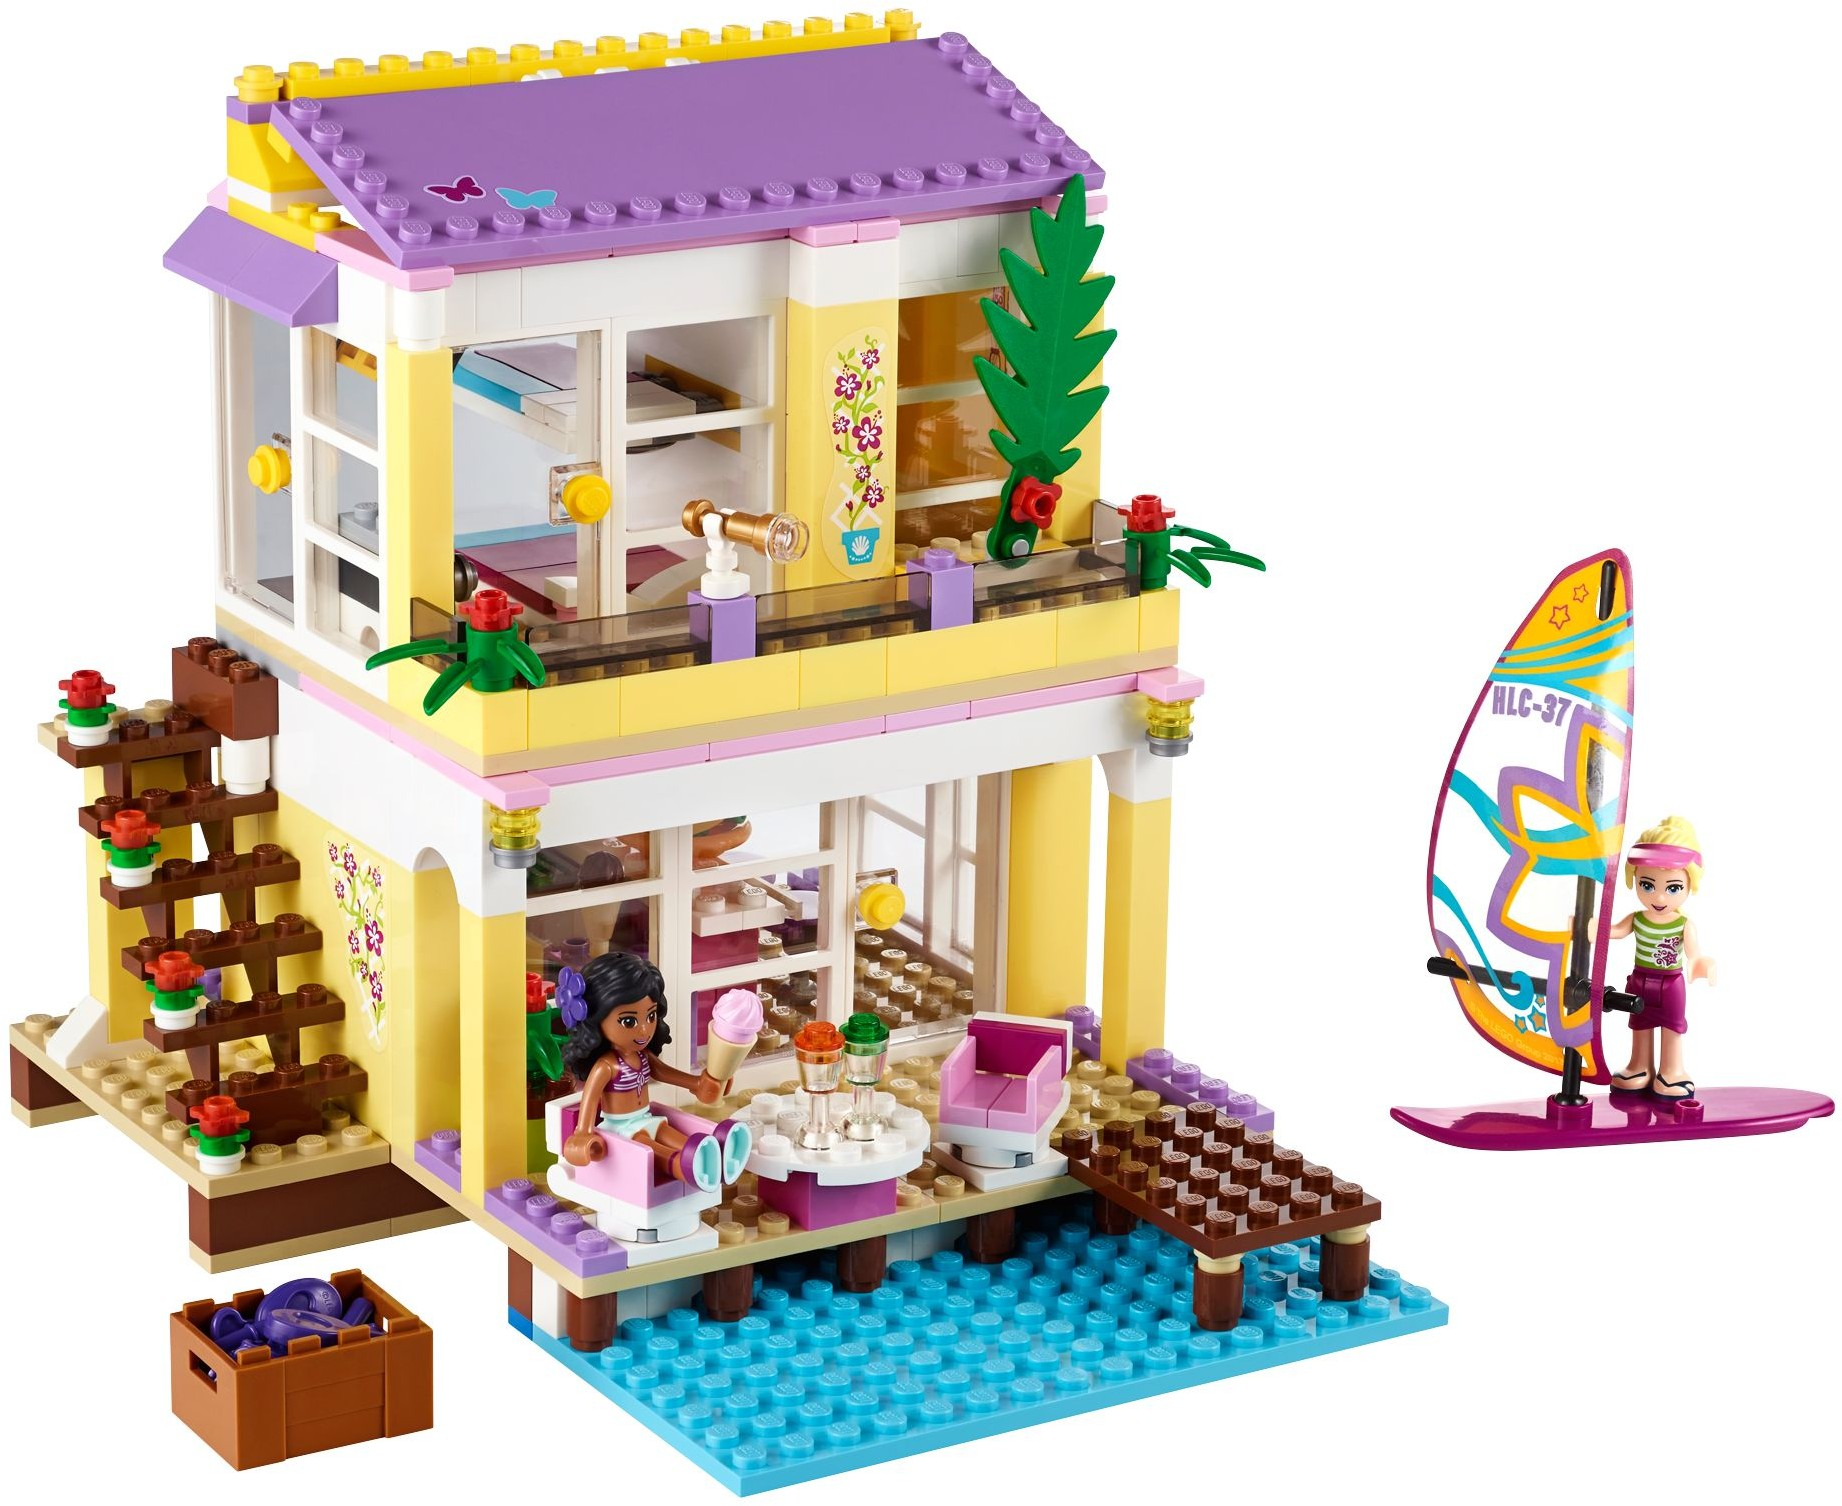 Friends 2014 Brickset Lego Set Guide And Database